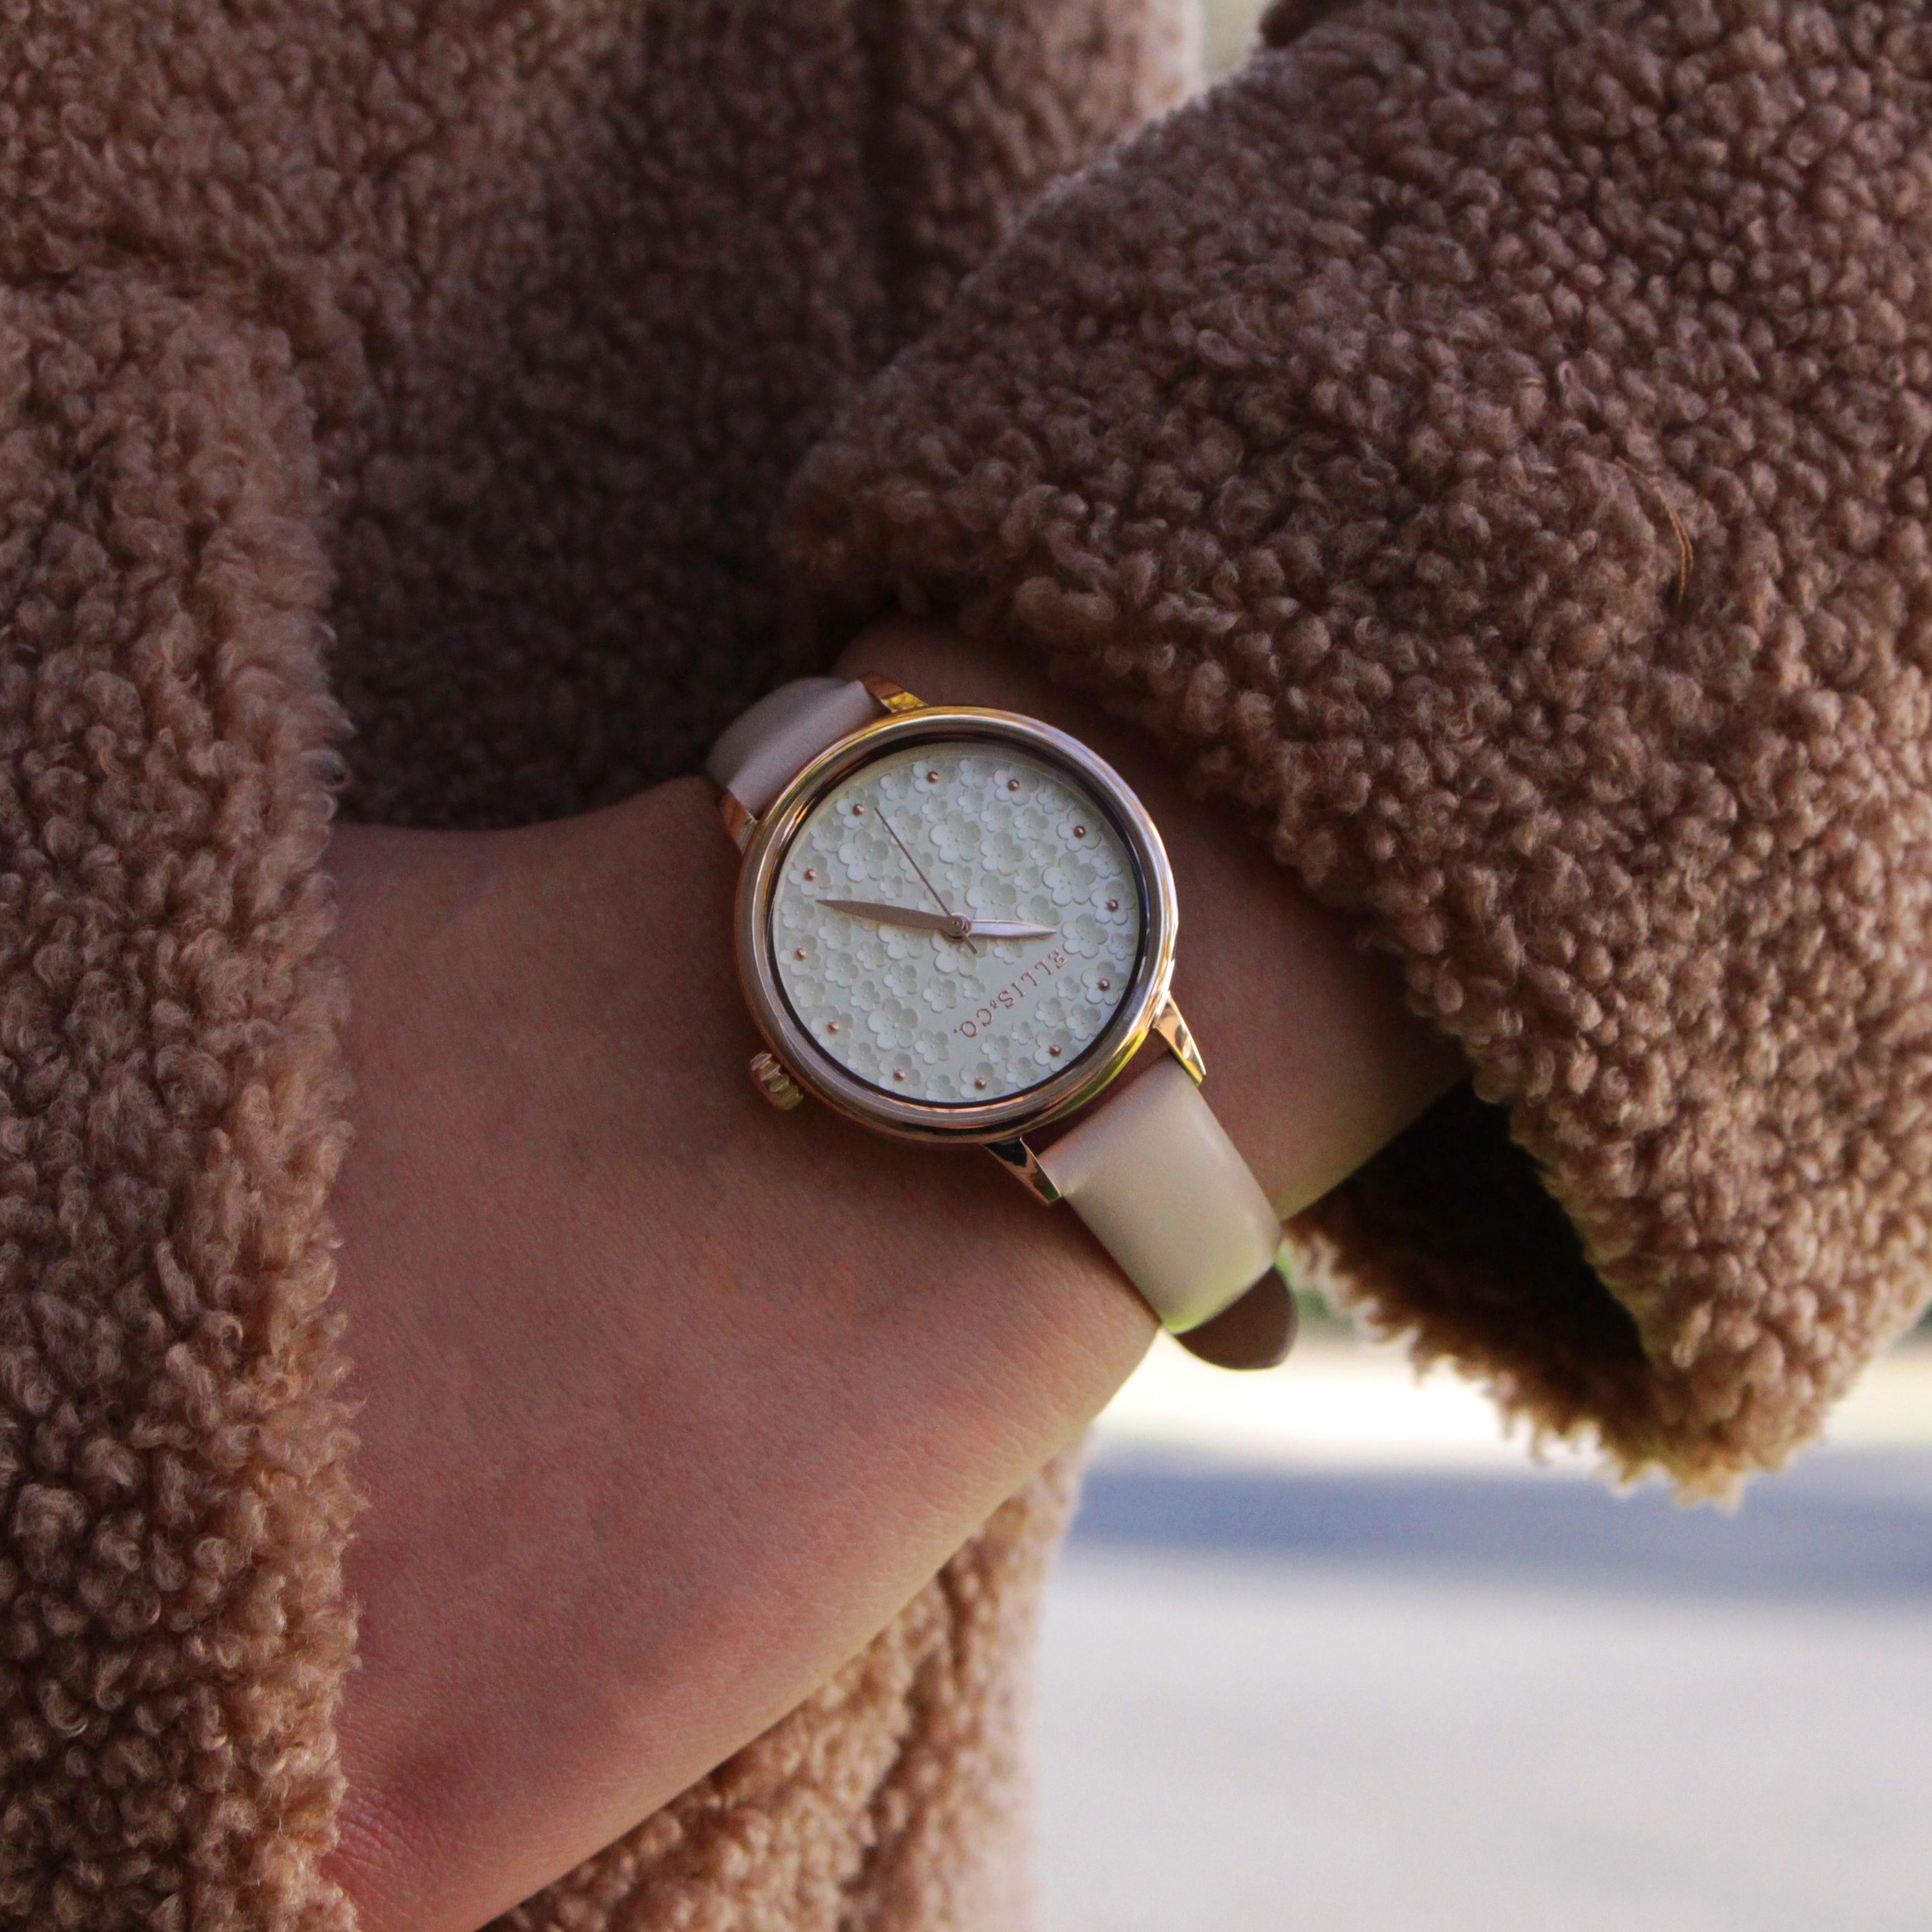 Ellis & Co Daisy Nude Leather Womens Watch